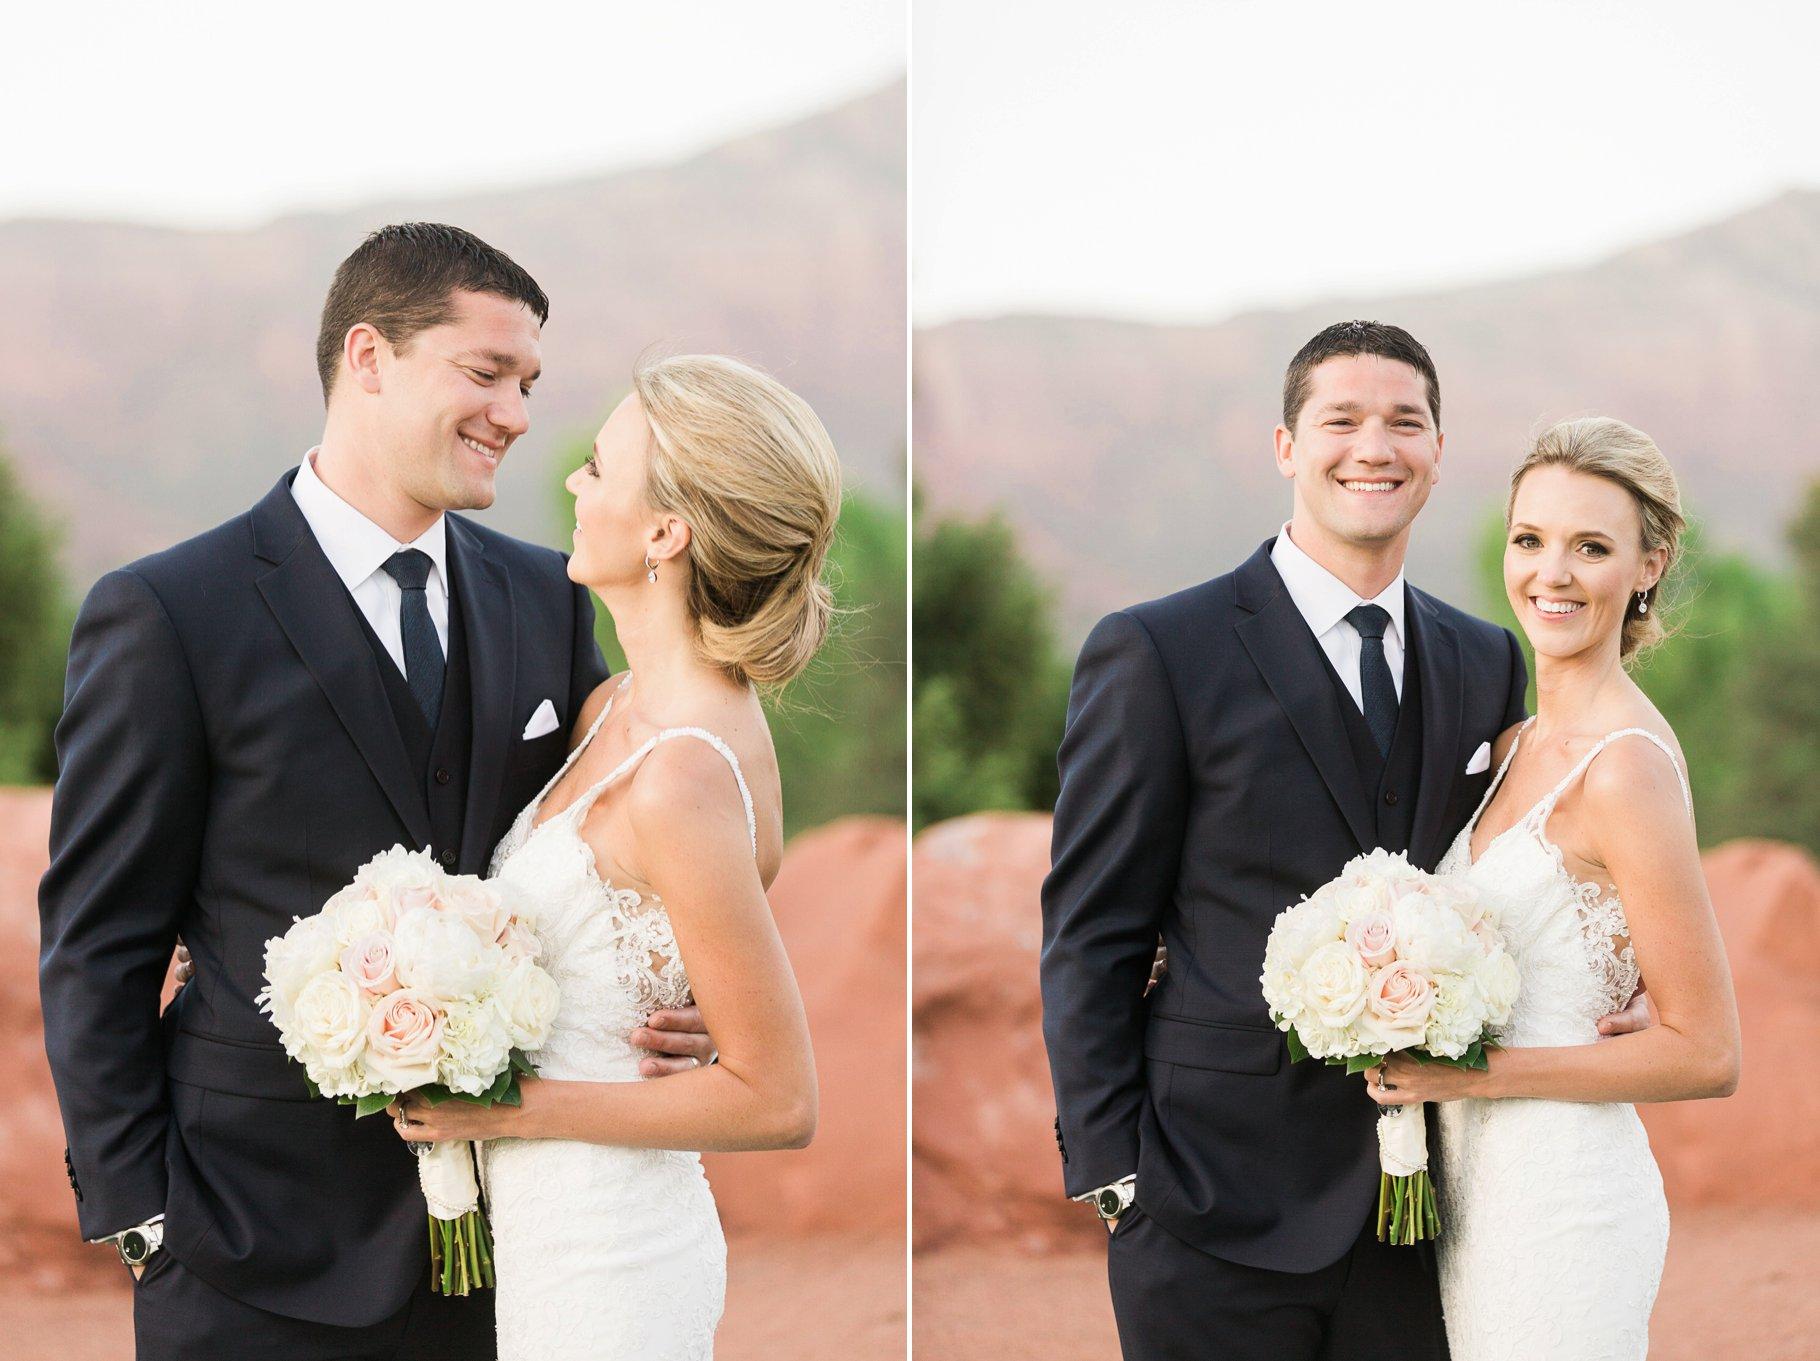 sedona wedding-109_GRETCHEN WAKEMAN PHOTOGRAPHY.jpg